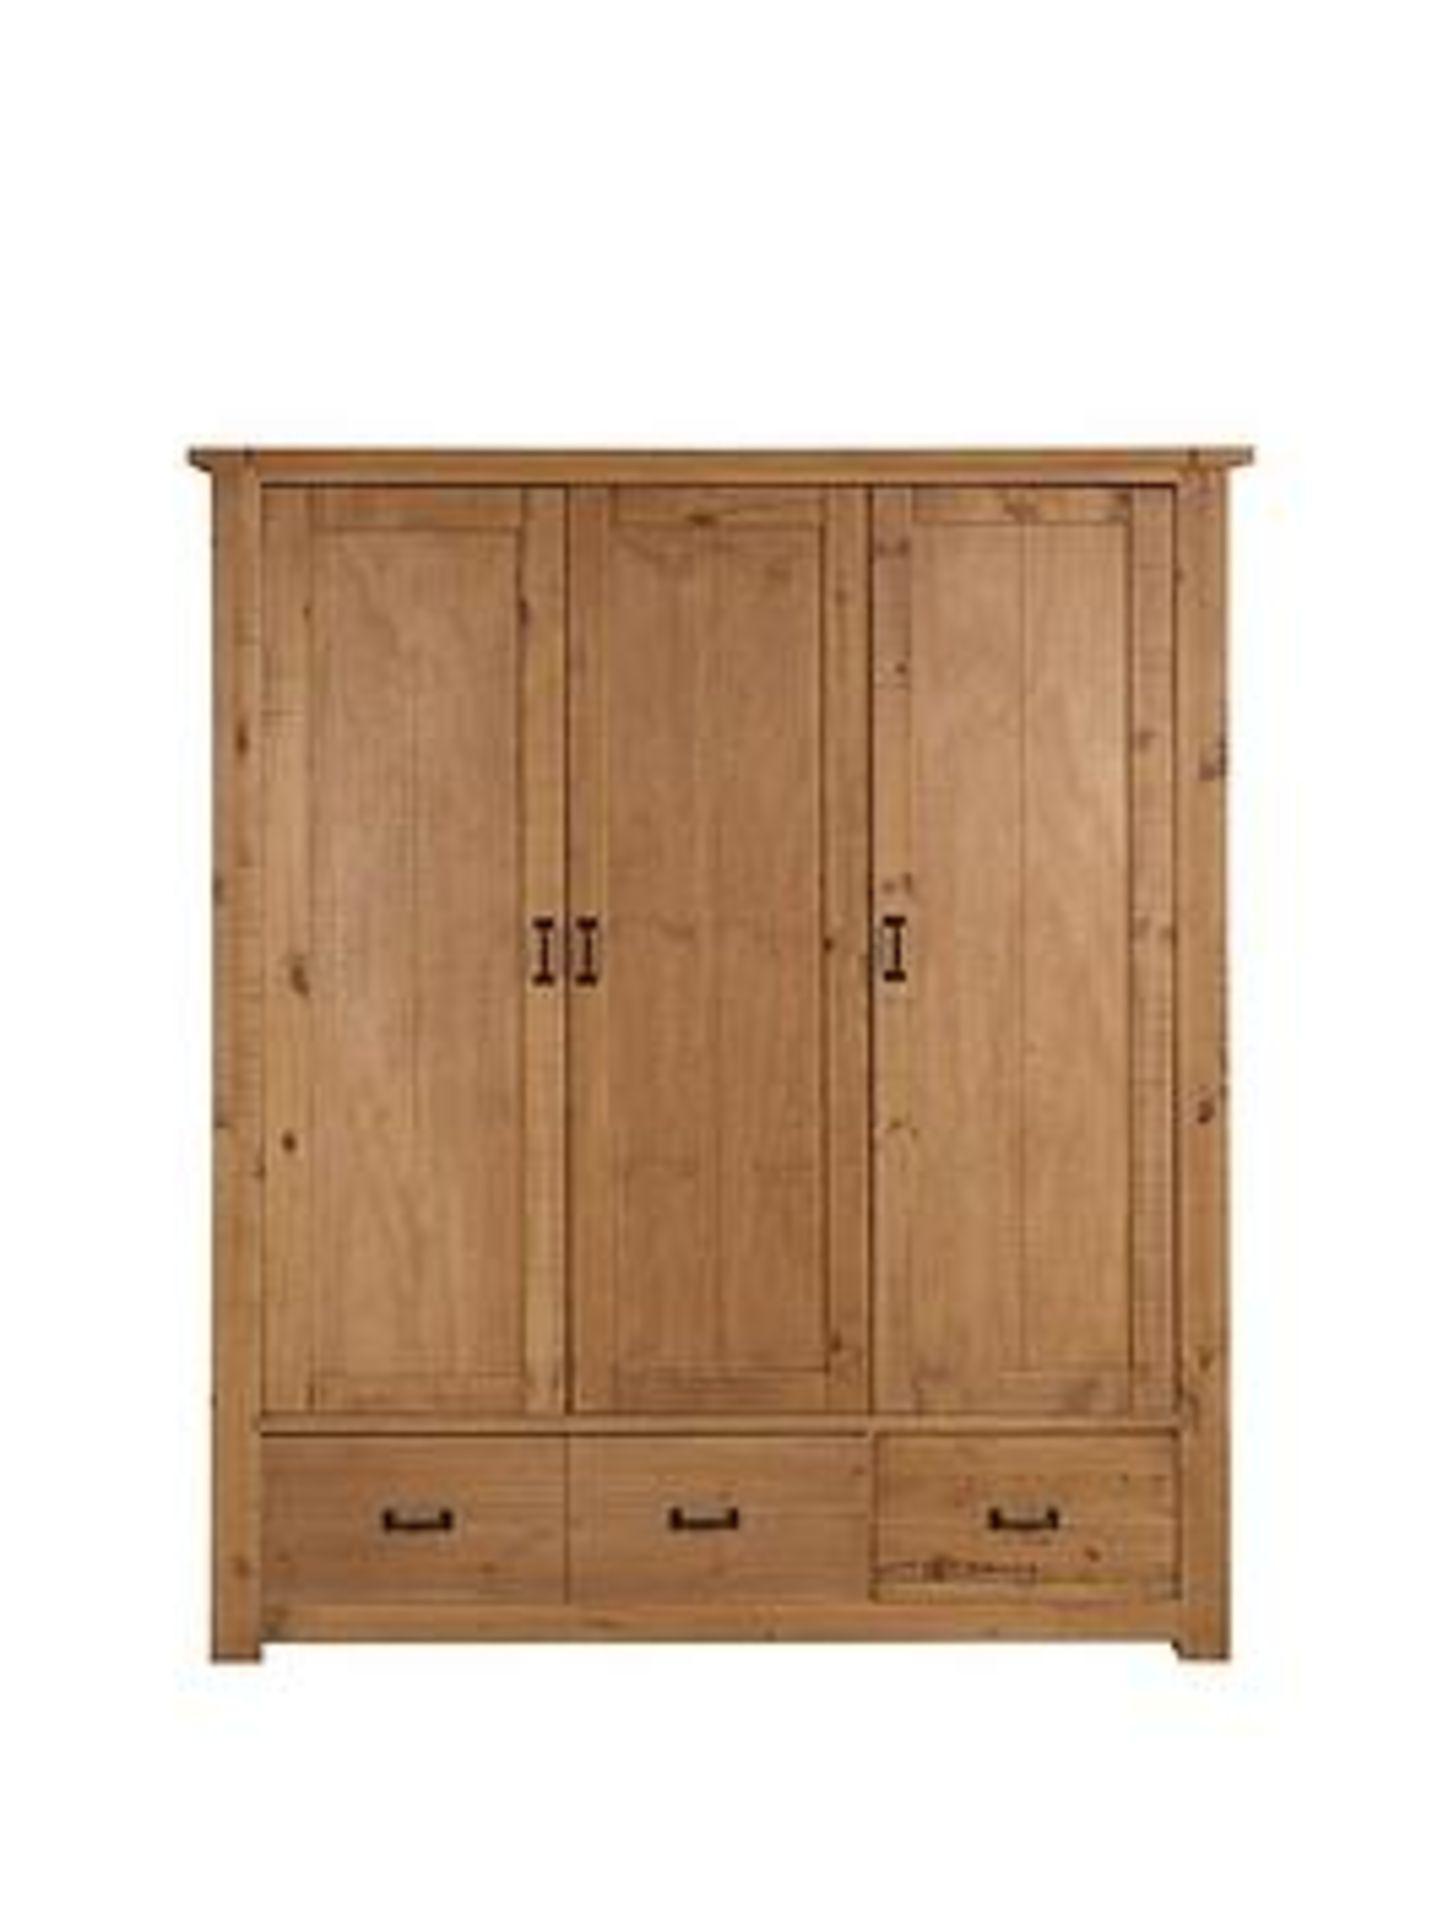 Lot 25 - Boxed Item Albion 3 Doors 3 Drawers Wardrobe [Pine] 185X157X56Cm Rrp:£569